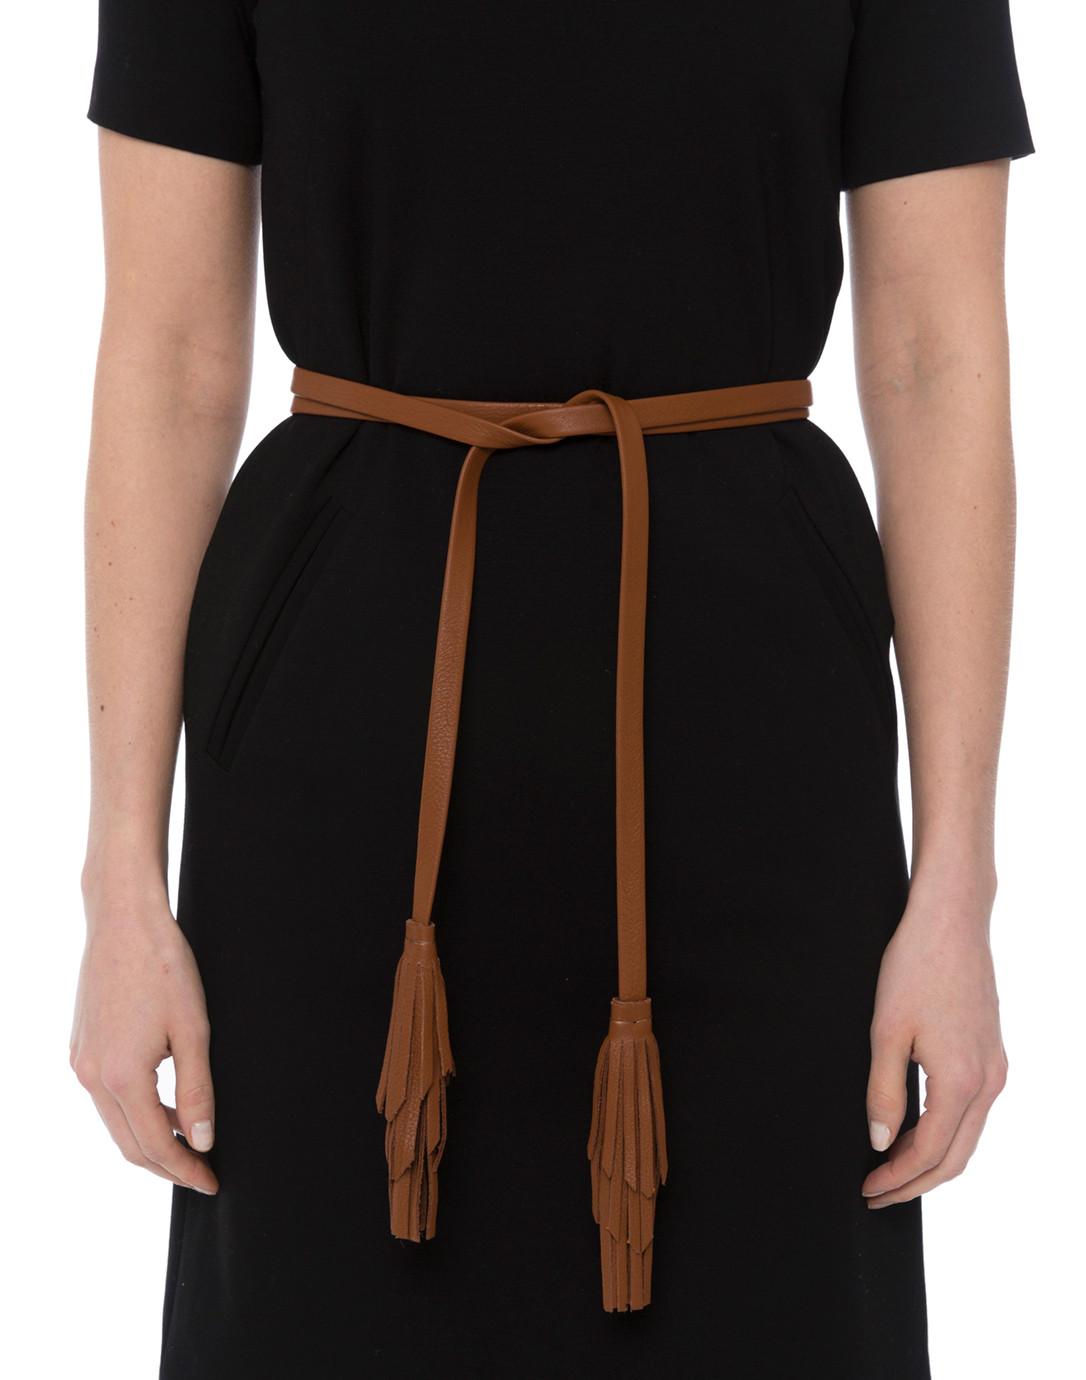 48539d5ca6ce5d Gatsby Brandy Leather Wrap Belt